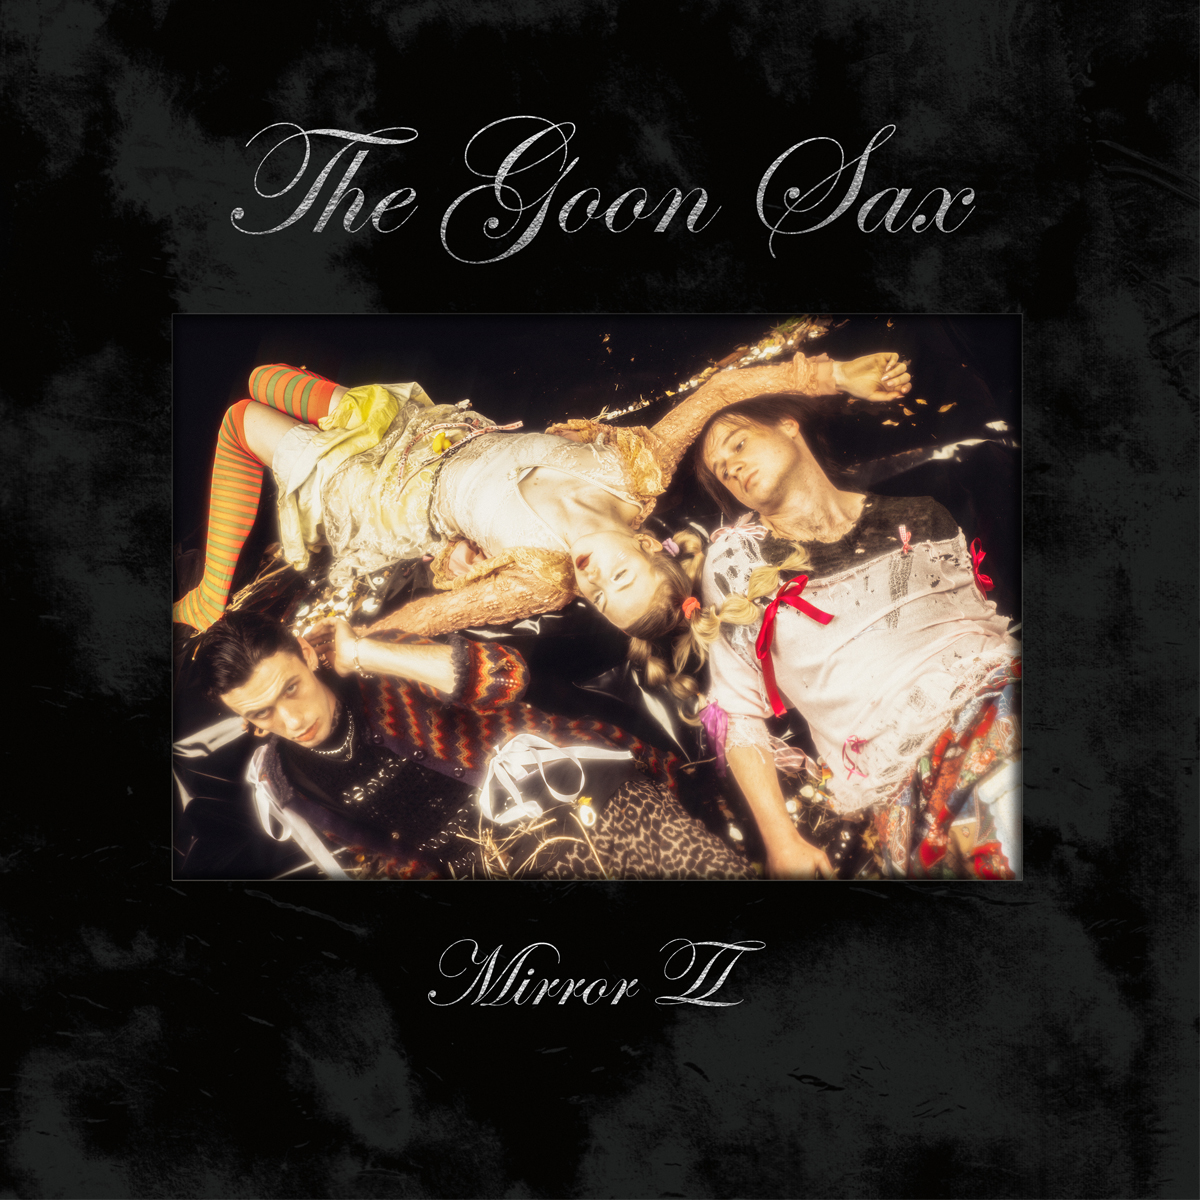 Goon Sax Mirror II album cover art 2021